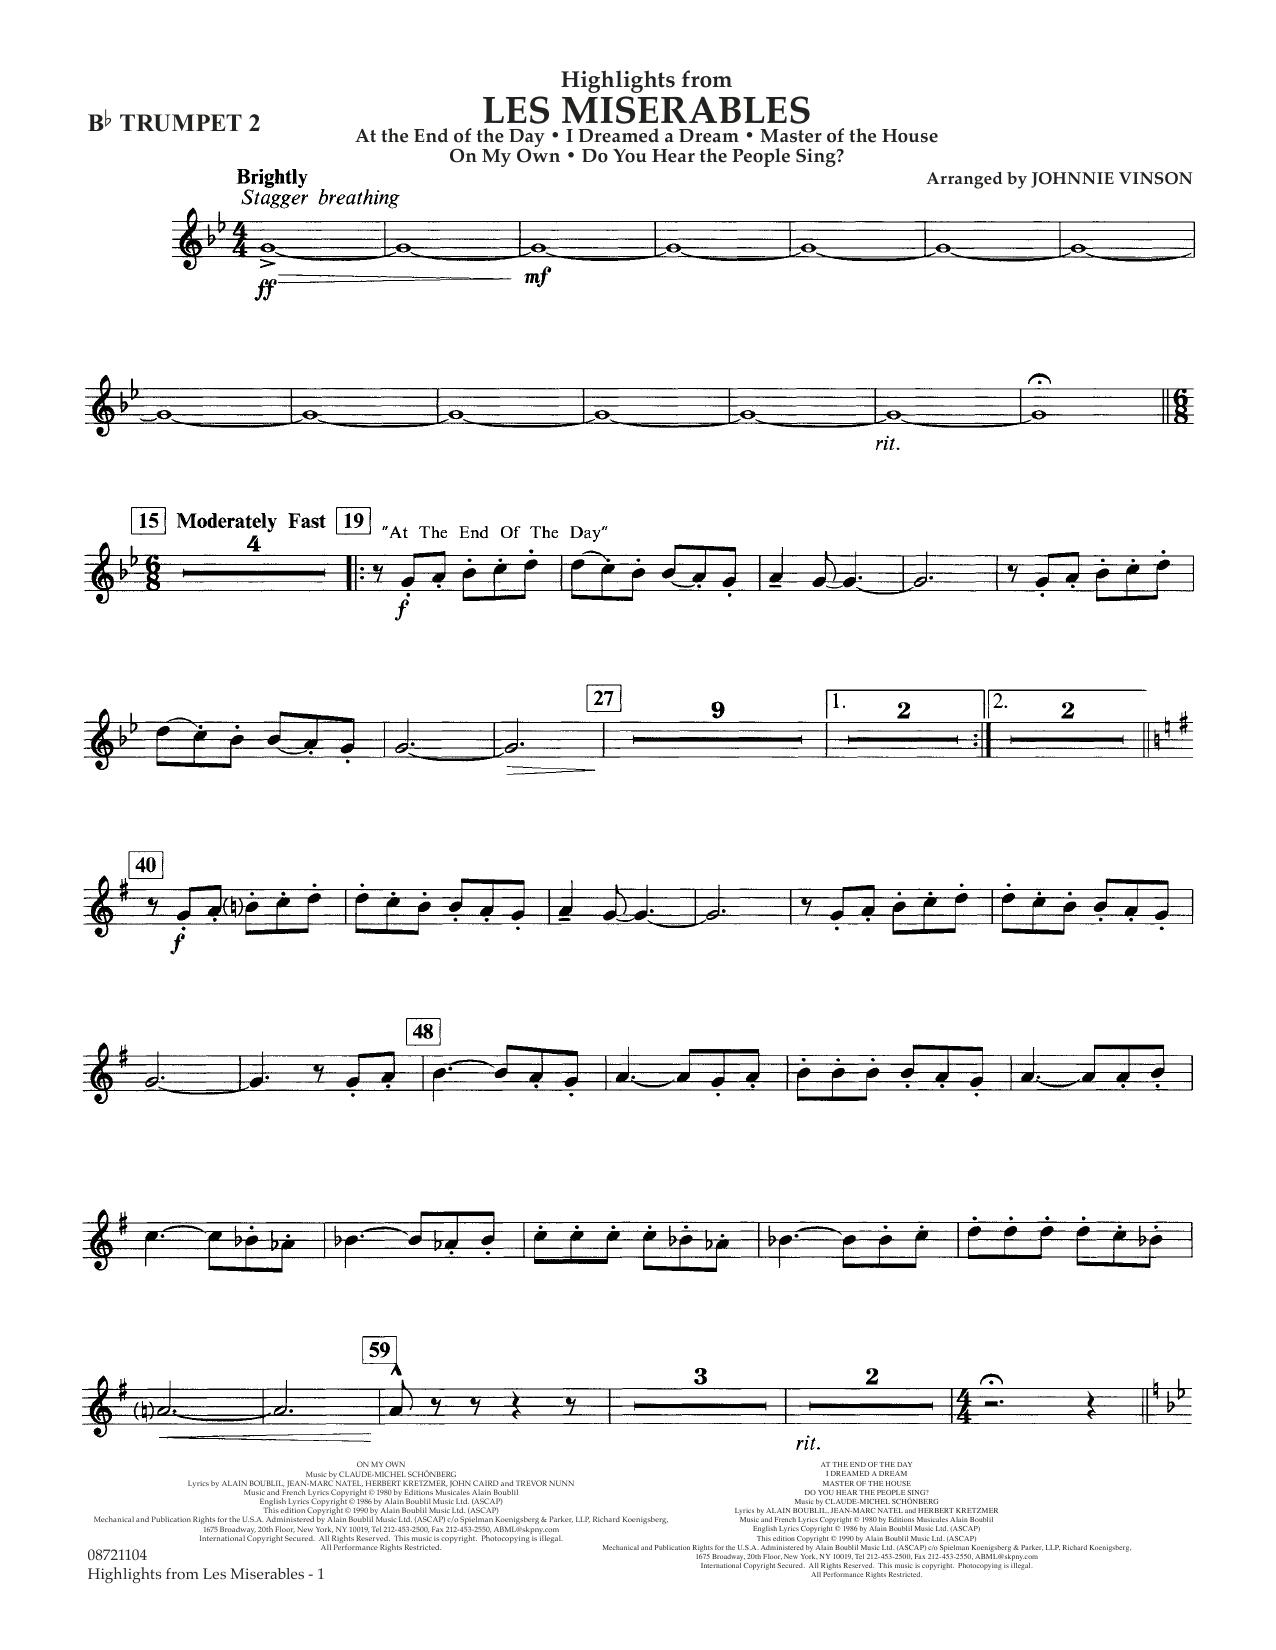 Highlights from Les Misérables (arr. Johnnie Vinson) - Bb Trumpet 2 (Concert Band)